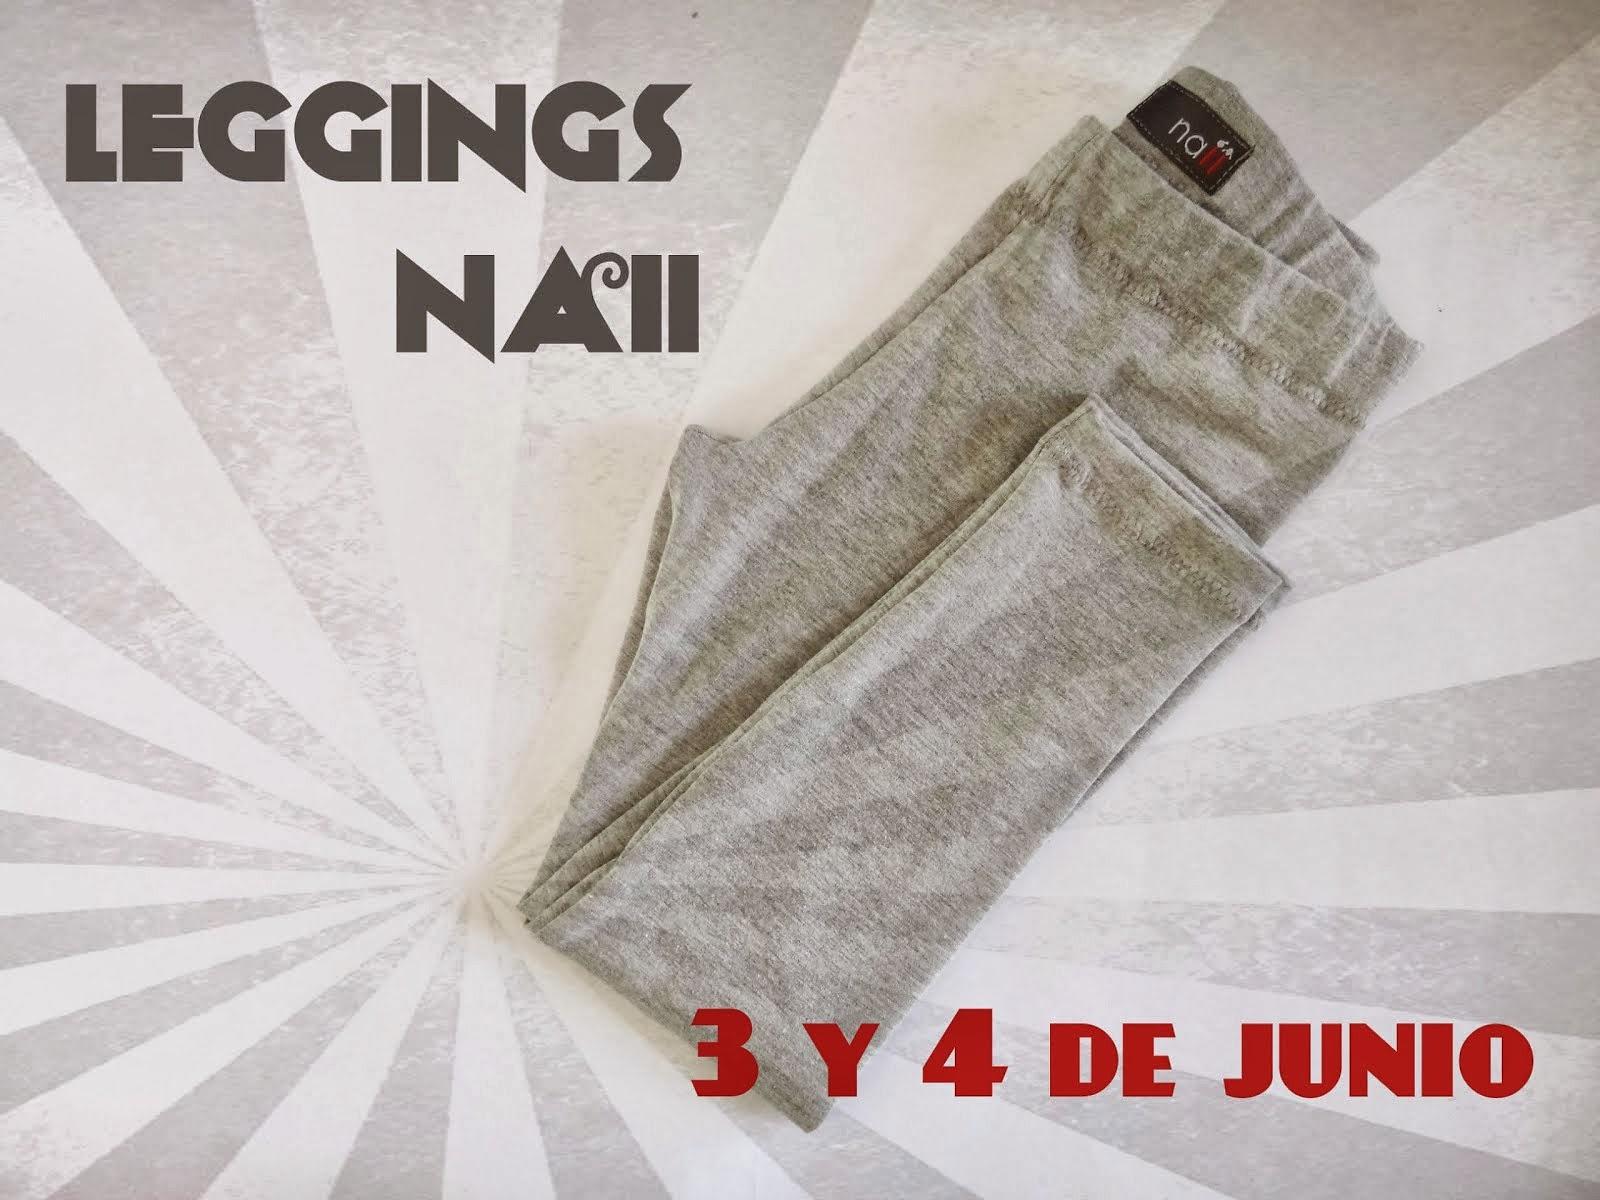 CC Leggins de Naii